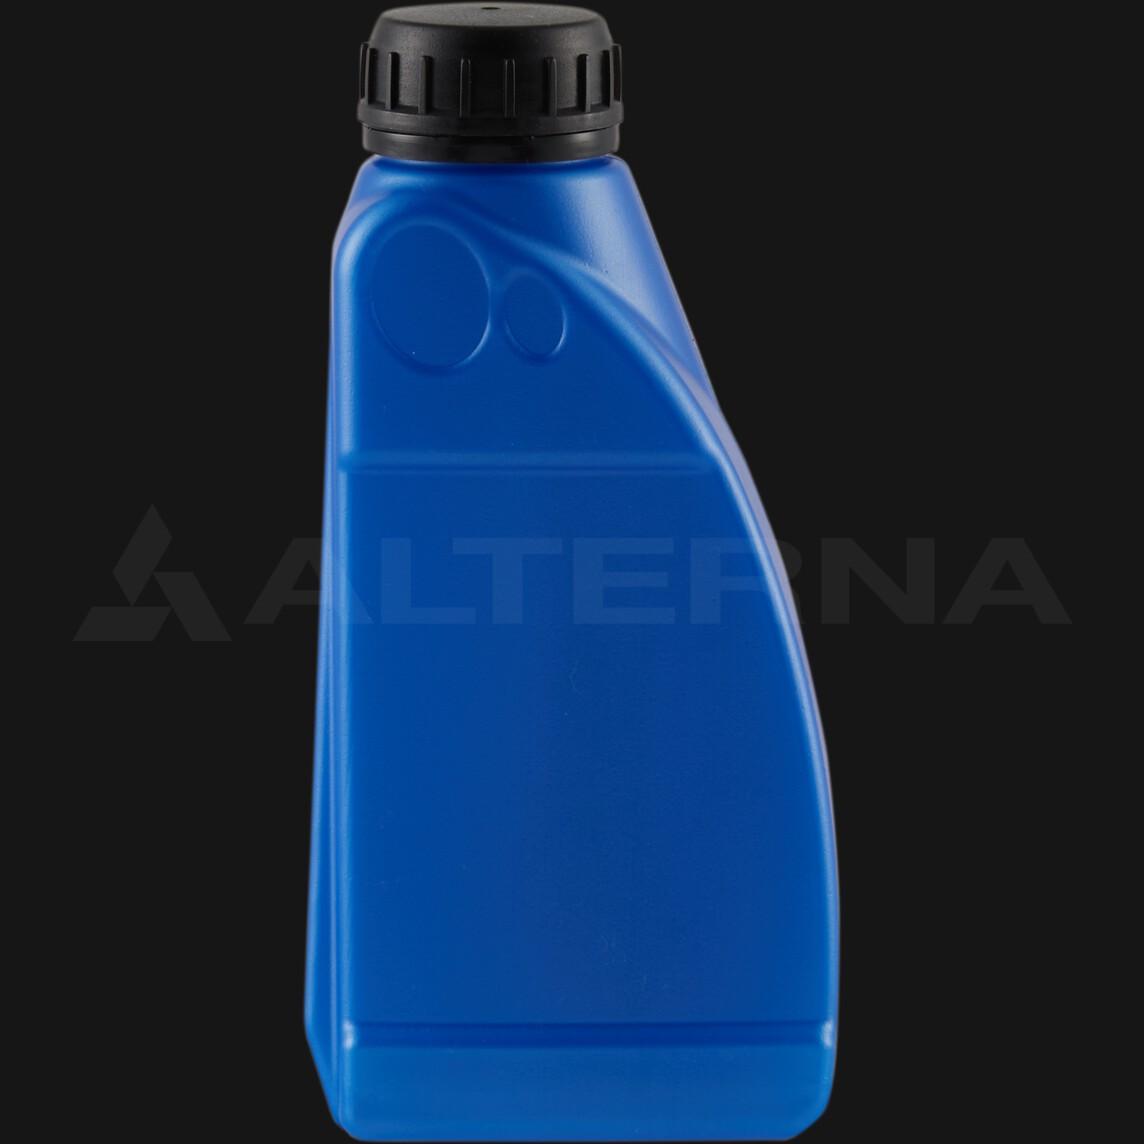 500 ml HDPE Motor Oil Bottle with 38 mm Alu. Seal Secure Cap